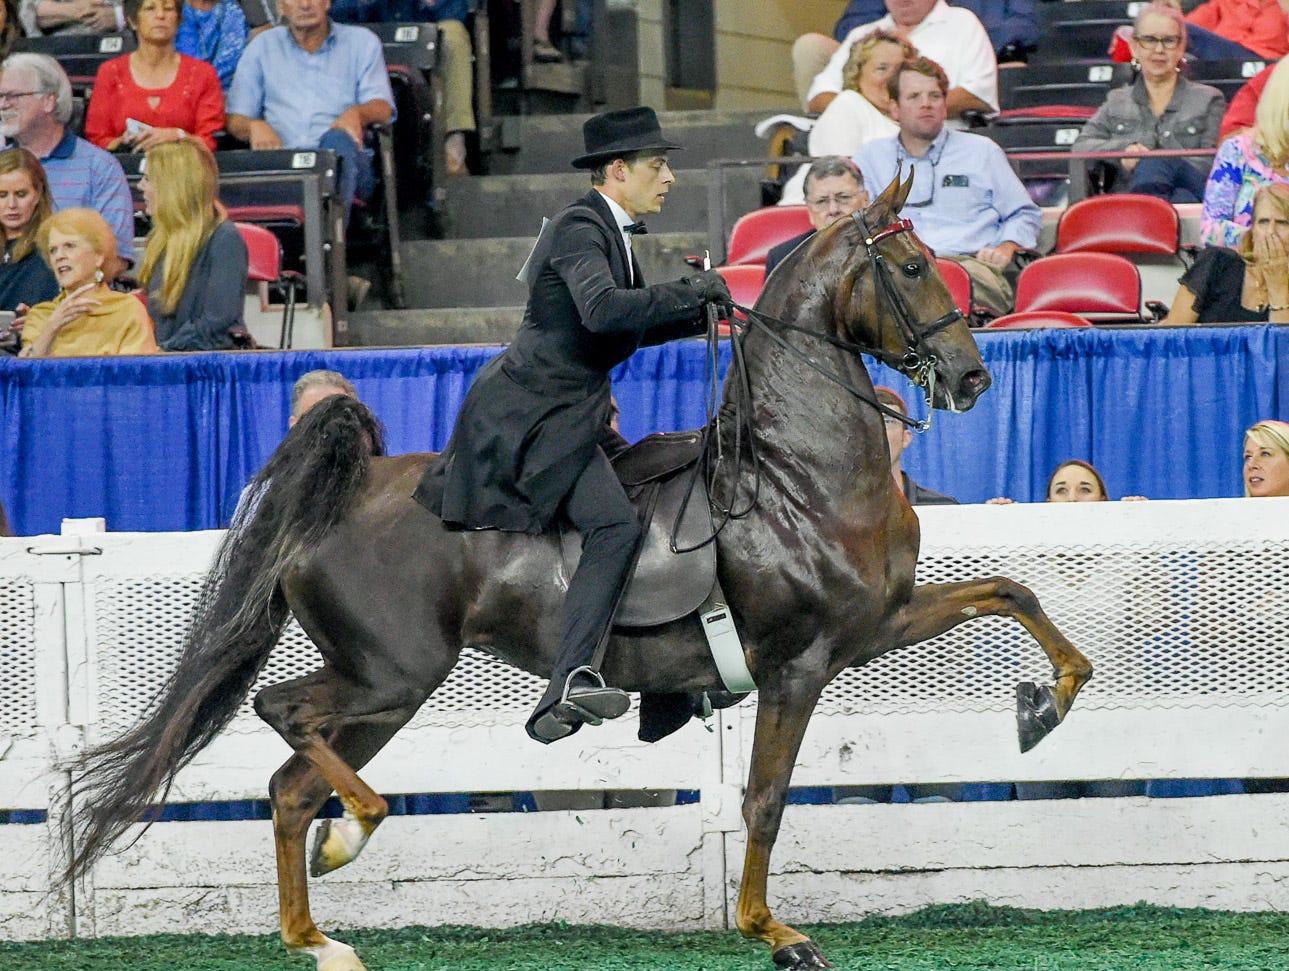 Now Performing Nightly (151819M) (RWC) 2014 Mountainview's Heir To Fortune (110645S) (WC) X Twice Nightly (143318M) (RWC) Owner: CC Saddlebreds LLC Louisville, KY Breeder: CC Saddlebreds LLC Exhibitor: Tyler DevoreTrainer: Tammy Devore